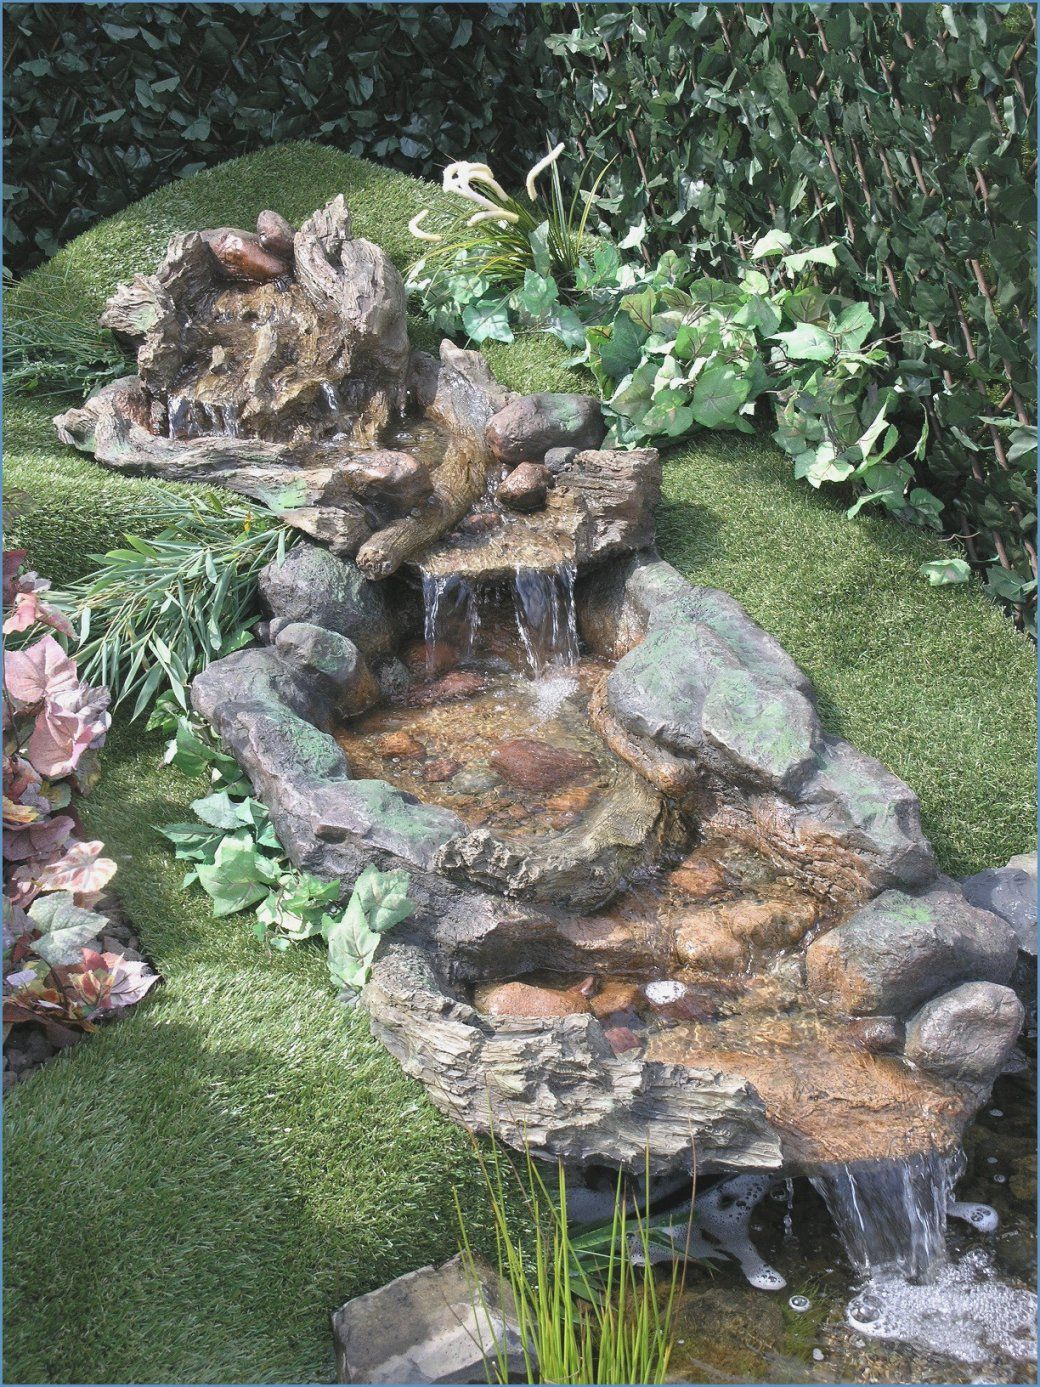 Wasserfall Garten Selber Bauen  Garten Dekorieren Ideen Wasserfall von Kleinen Wasserfall Selber Bauen Bild